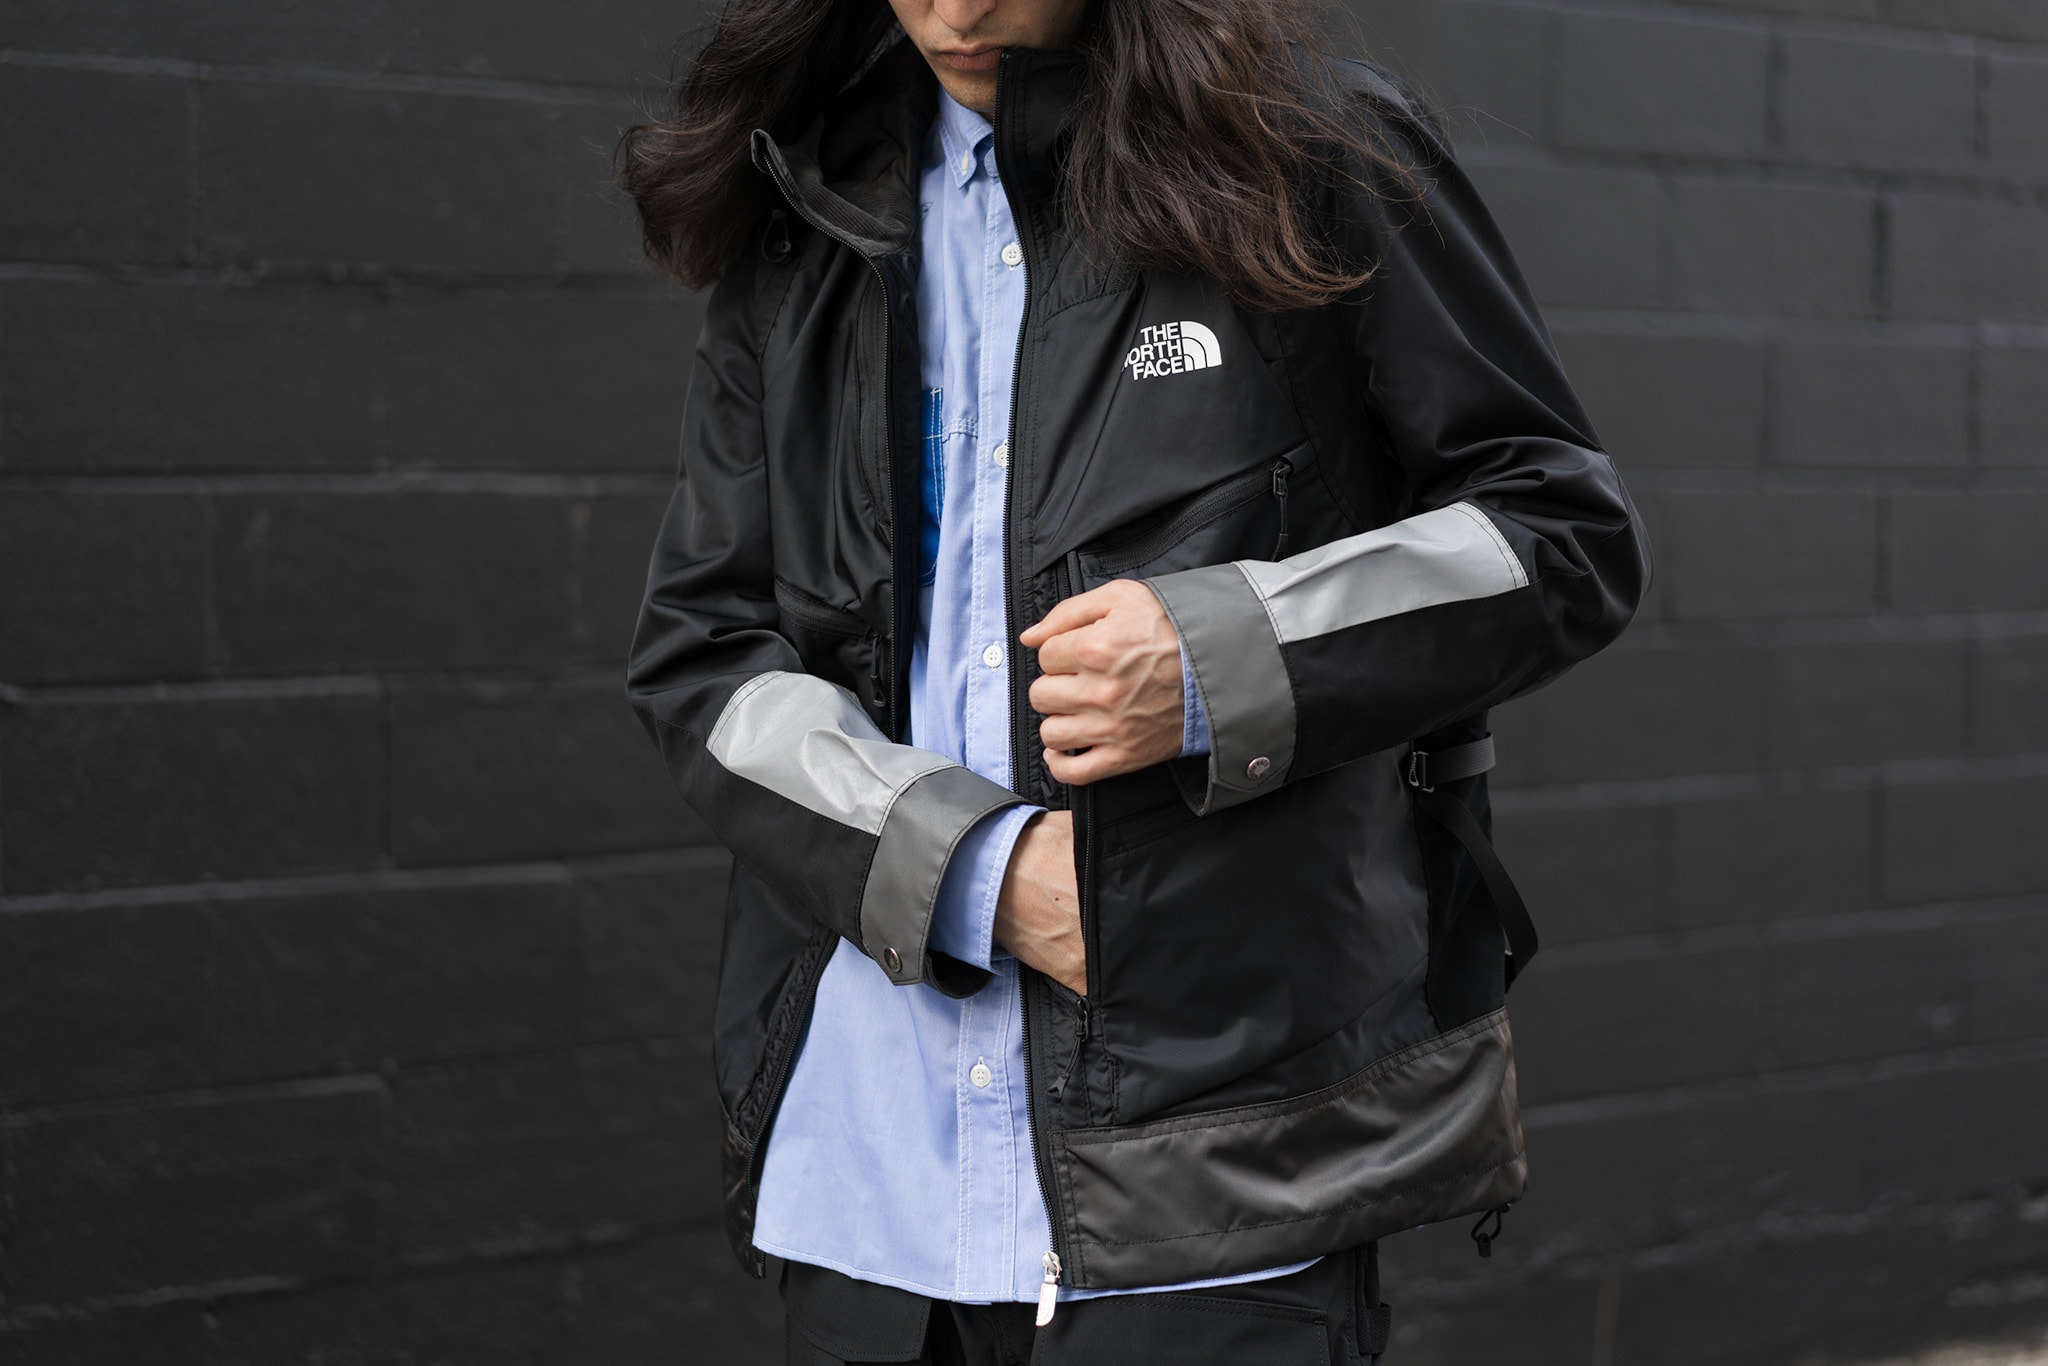 HAVEN Lookbook, Junya Watanabe MAN x The North Face Nylon Twill Trail Pack Jacket Black X Gray